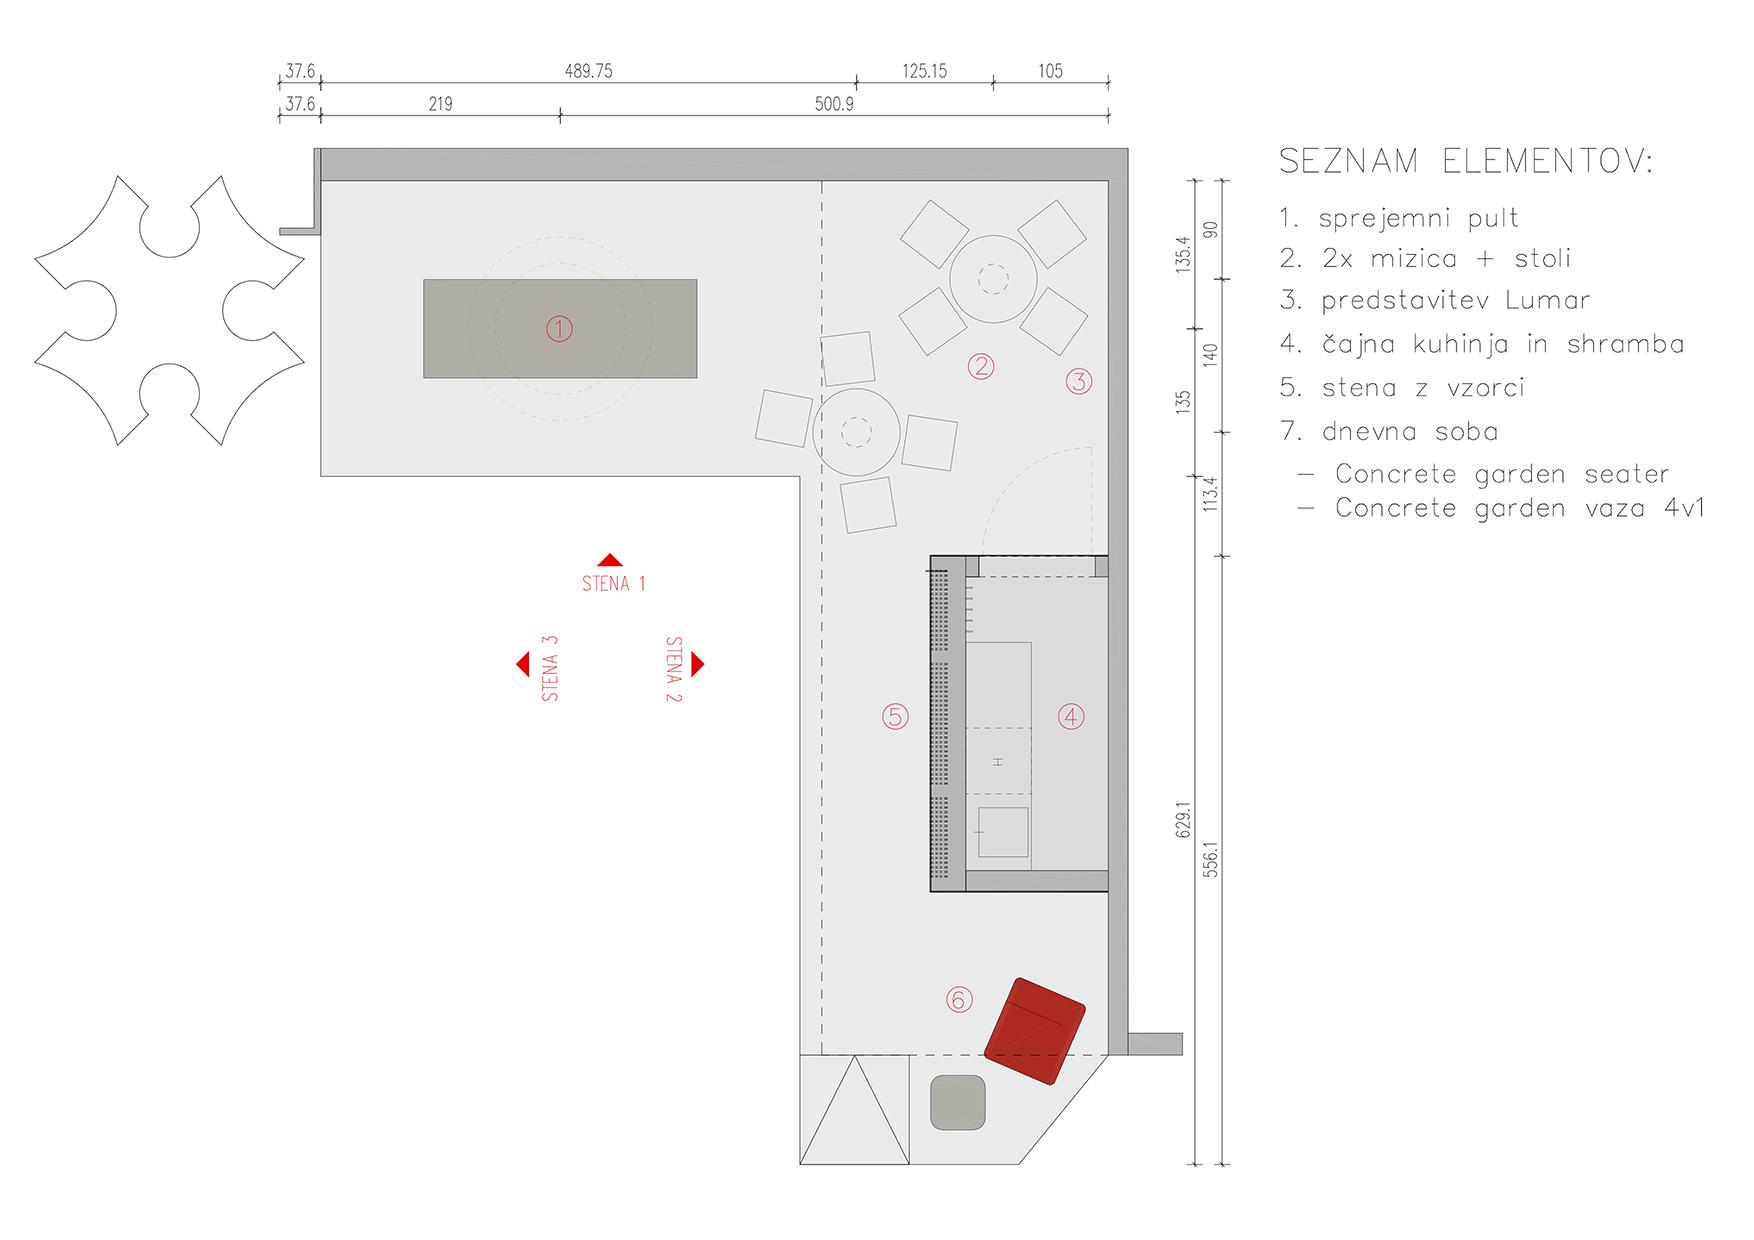 SR Eternit_plan_interior-Tina Rugelj.png